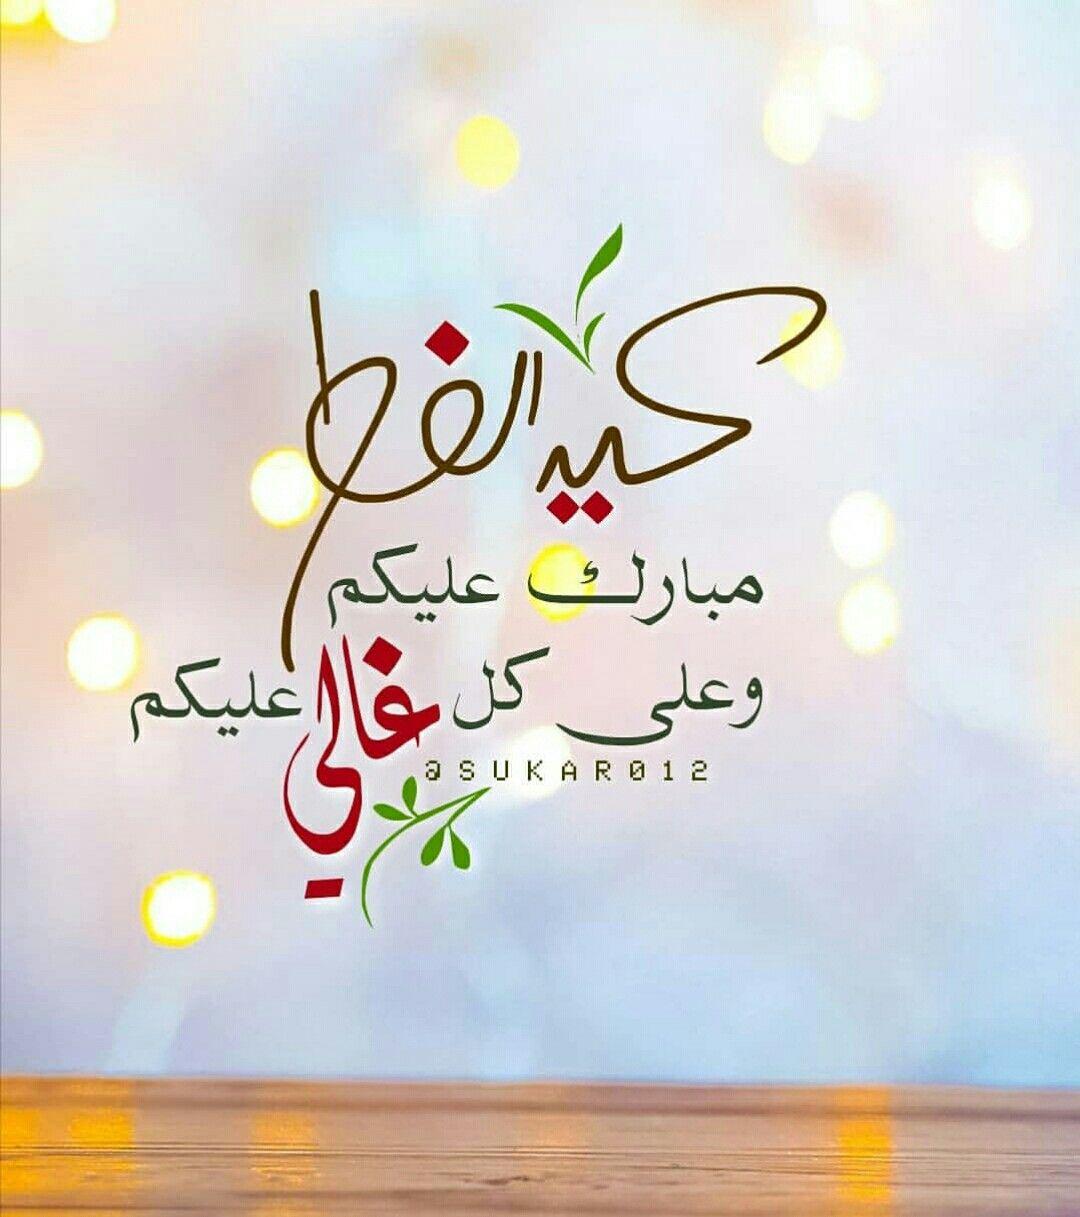 عيدكم مبارك Eid Greetings Happy Eid Eid Ul Adha